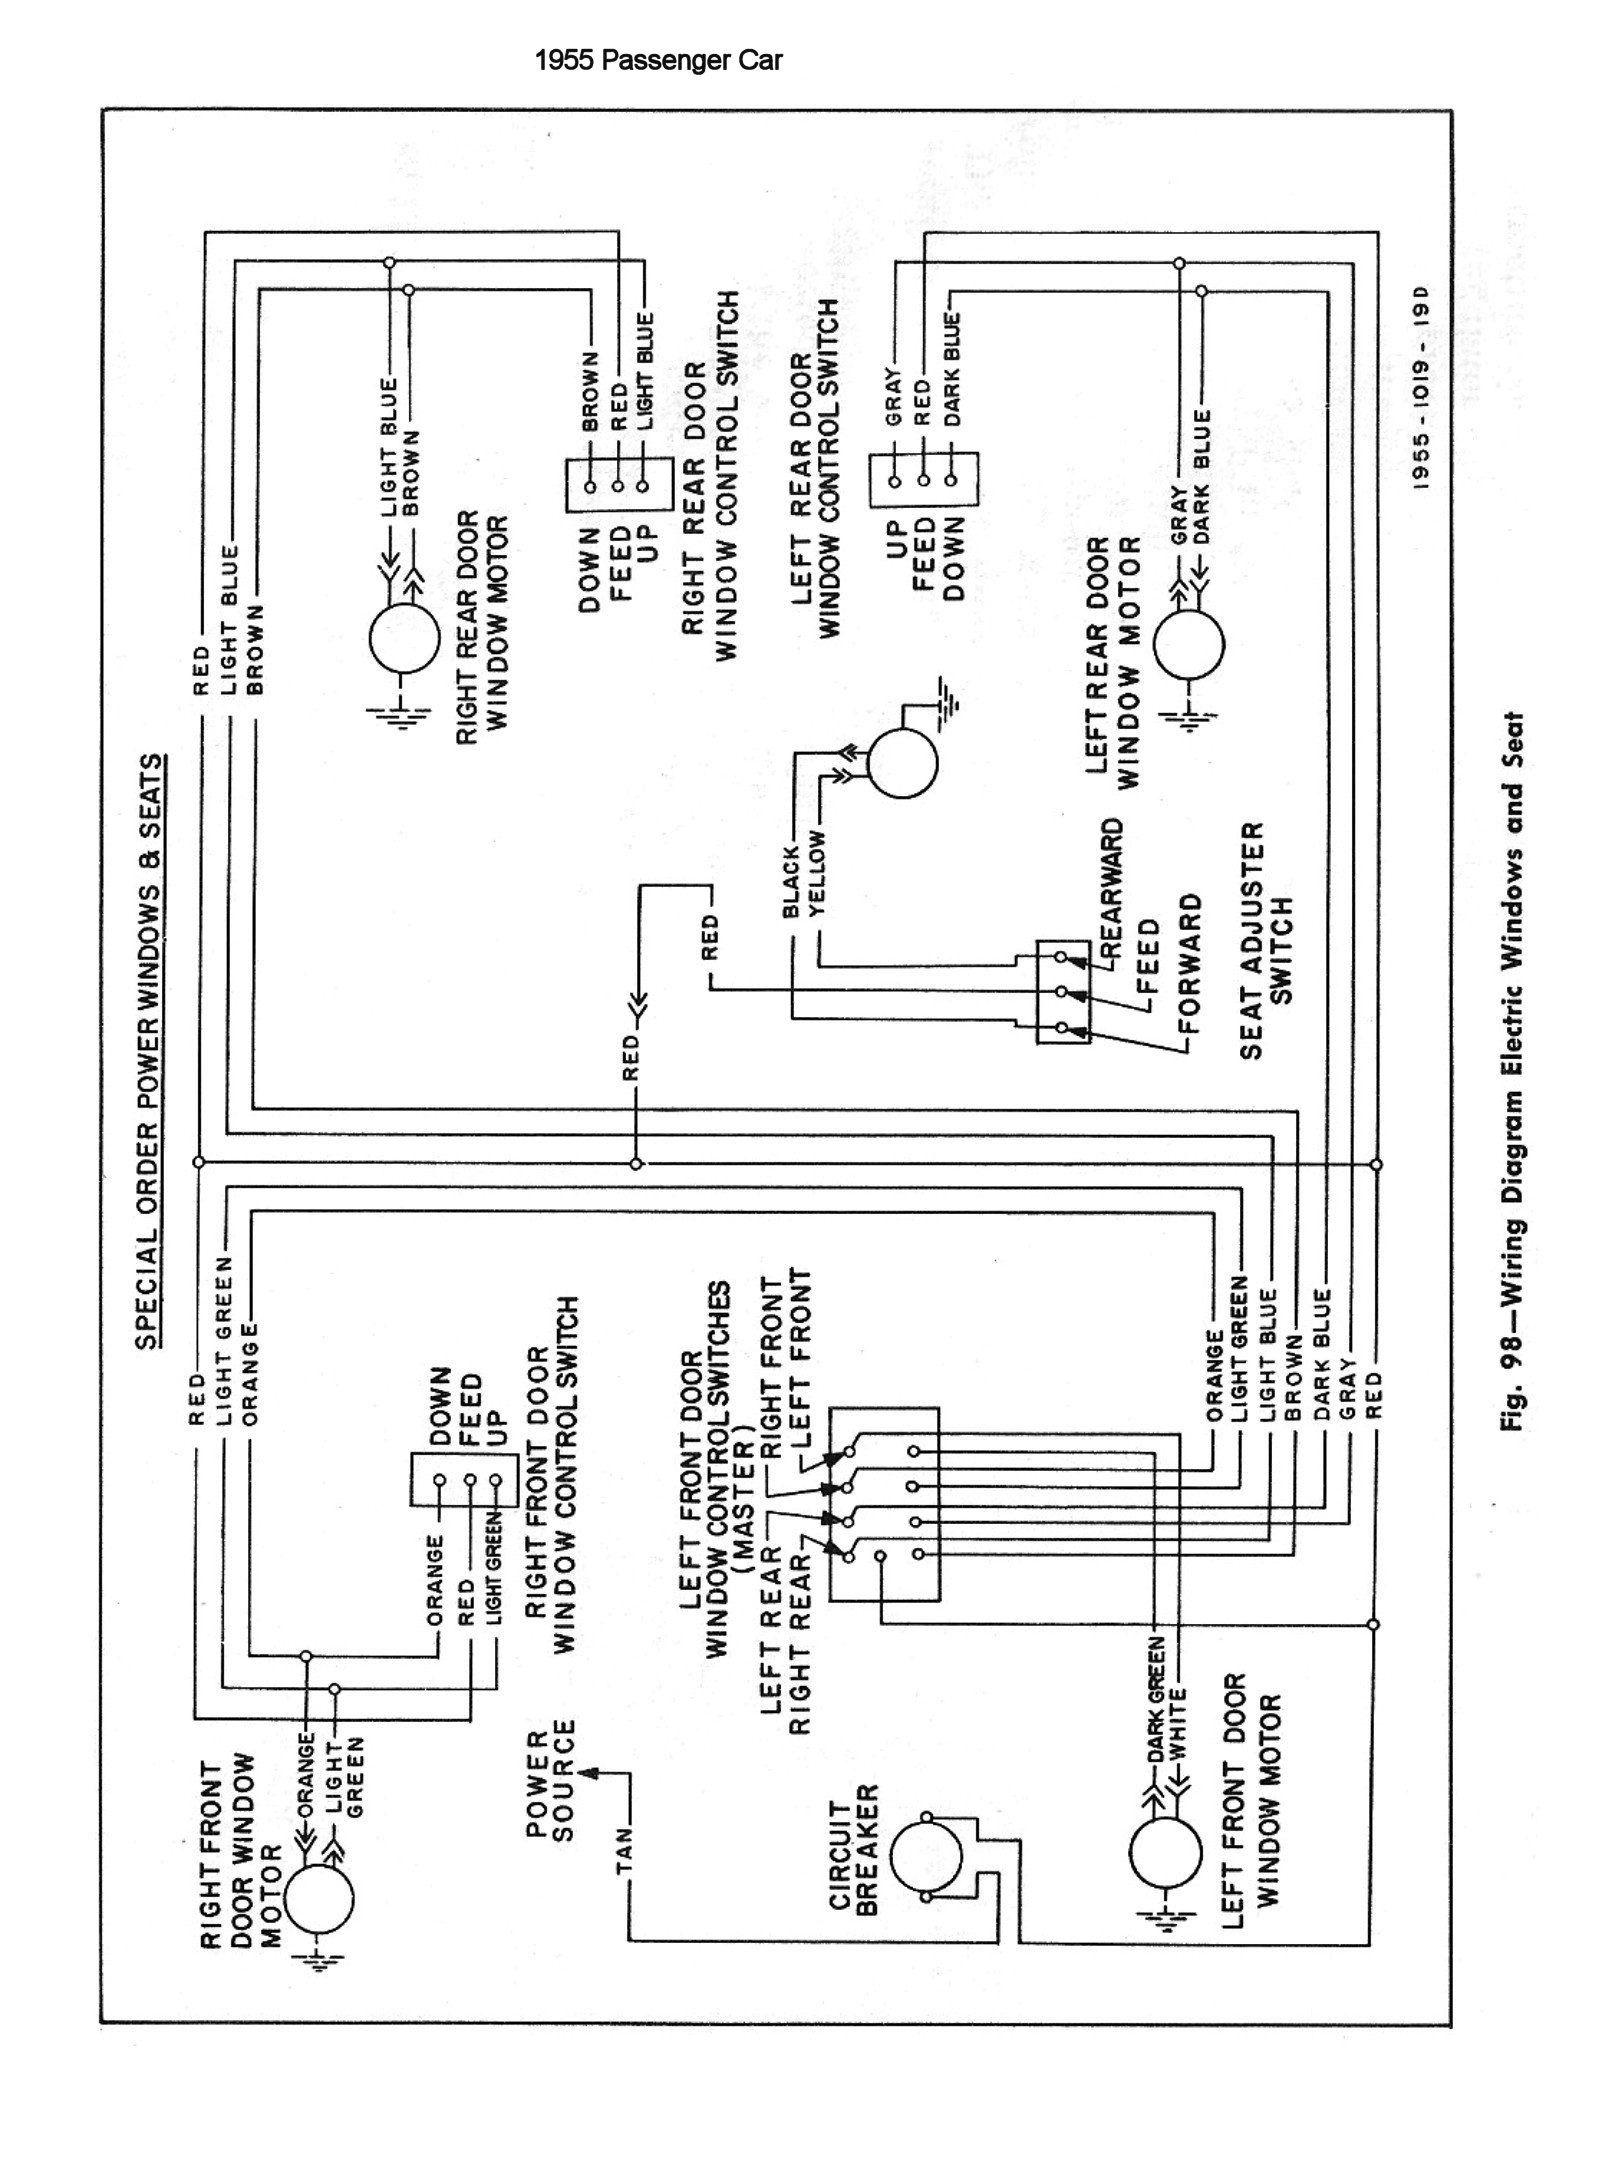 1955 Chevy Turn Signal Wiring Diagram Wiringdiagram Org 86 Chevy Truck Chevy Trucks 1955 Chevy